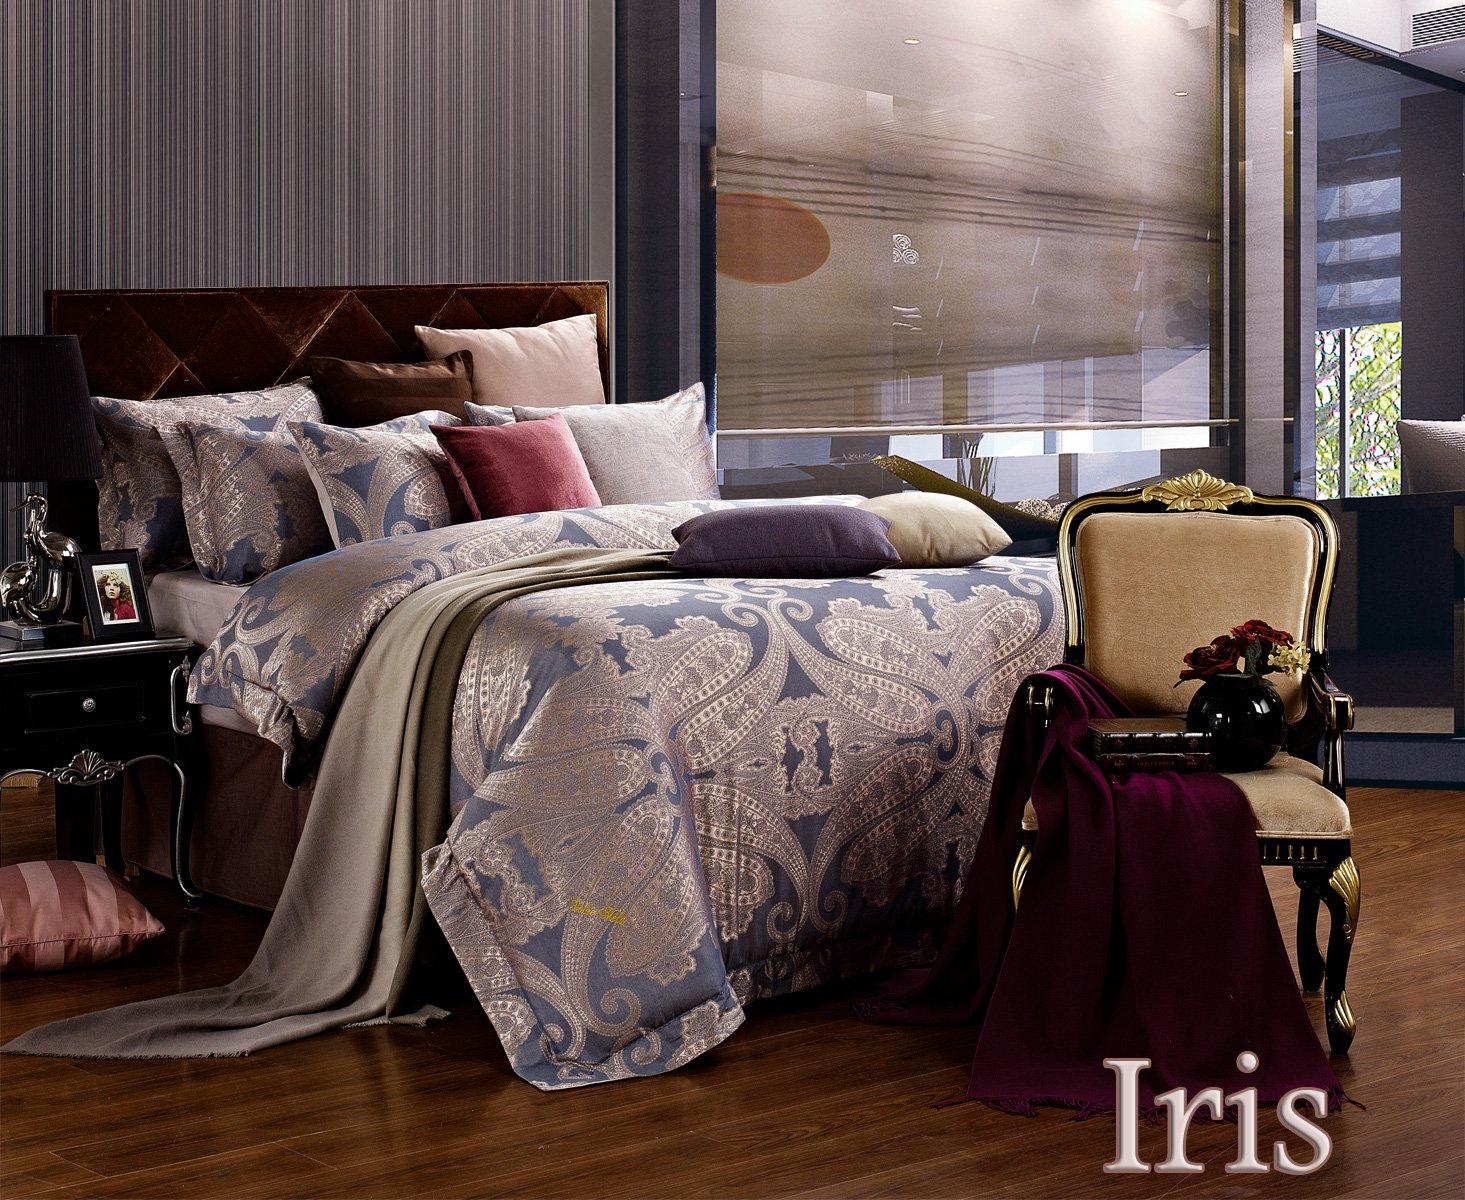 Iris By Dolce Mela 6 Pc Queen Size Duvet Cover Set Luxury